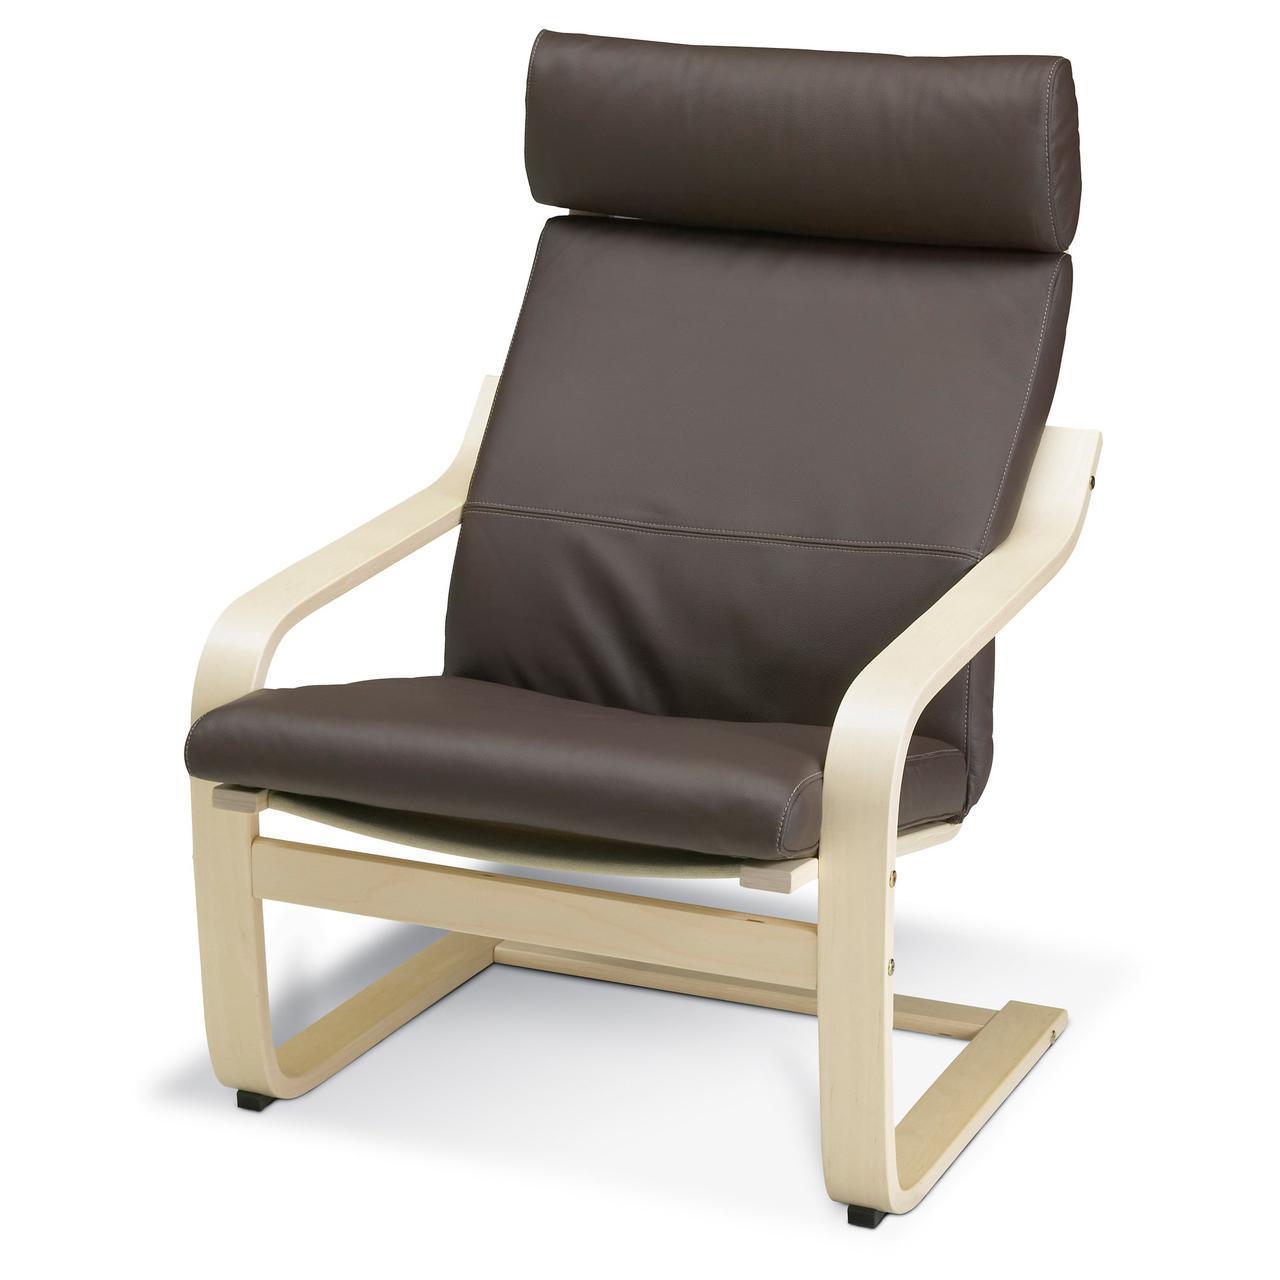 ✅ IKEA POANG (898.291.19) Кресло, ok birches, Прочный Glose ecru